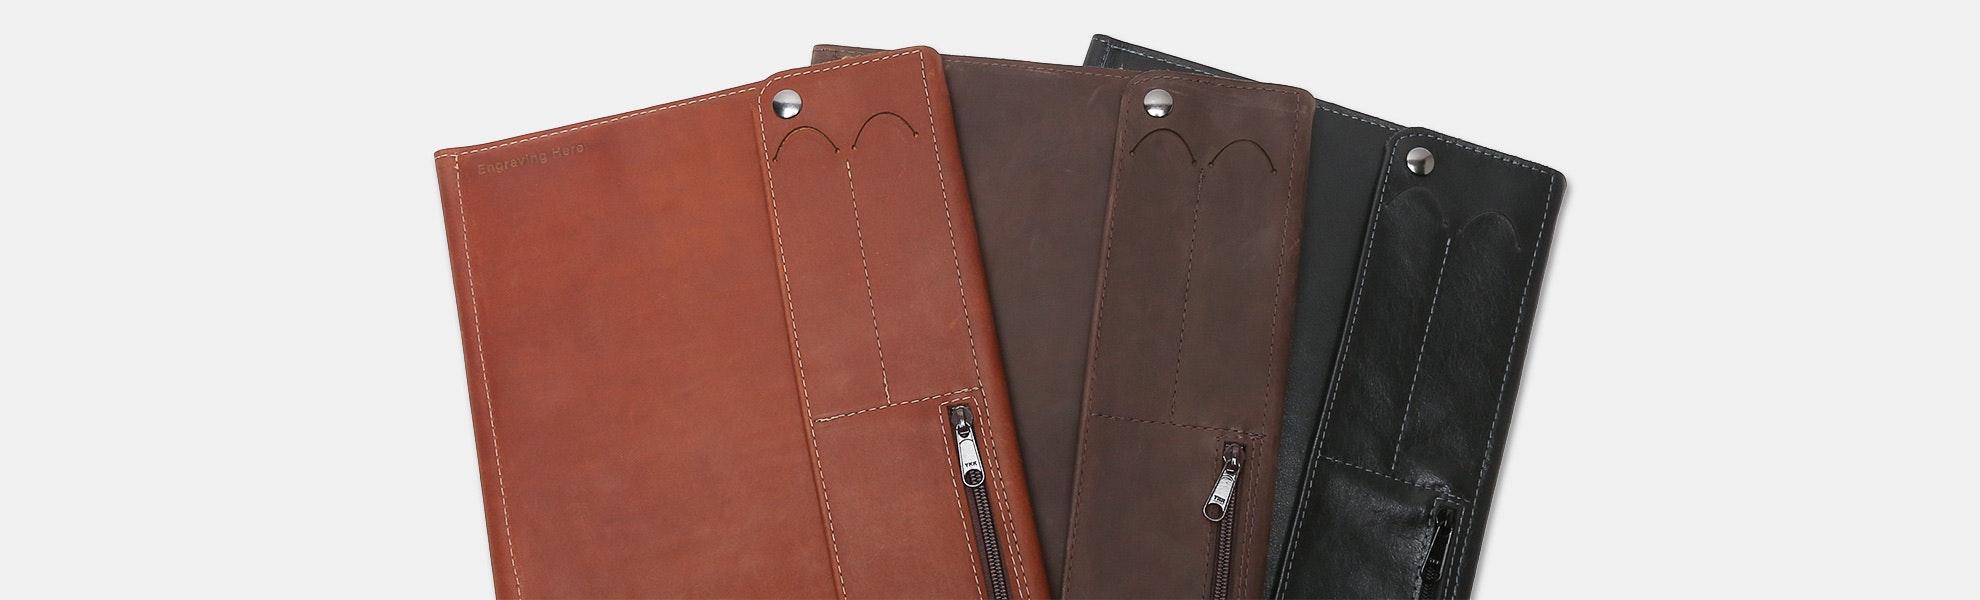 Allegory Leather Padfolio